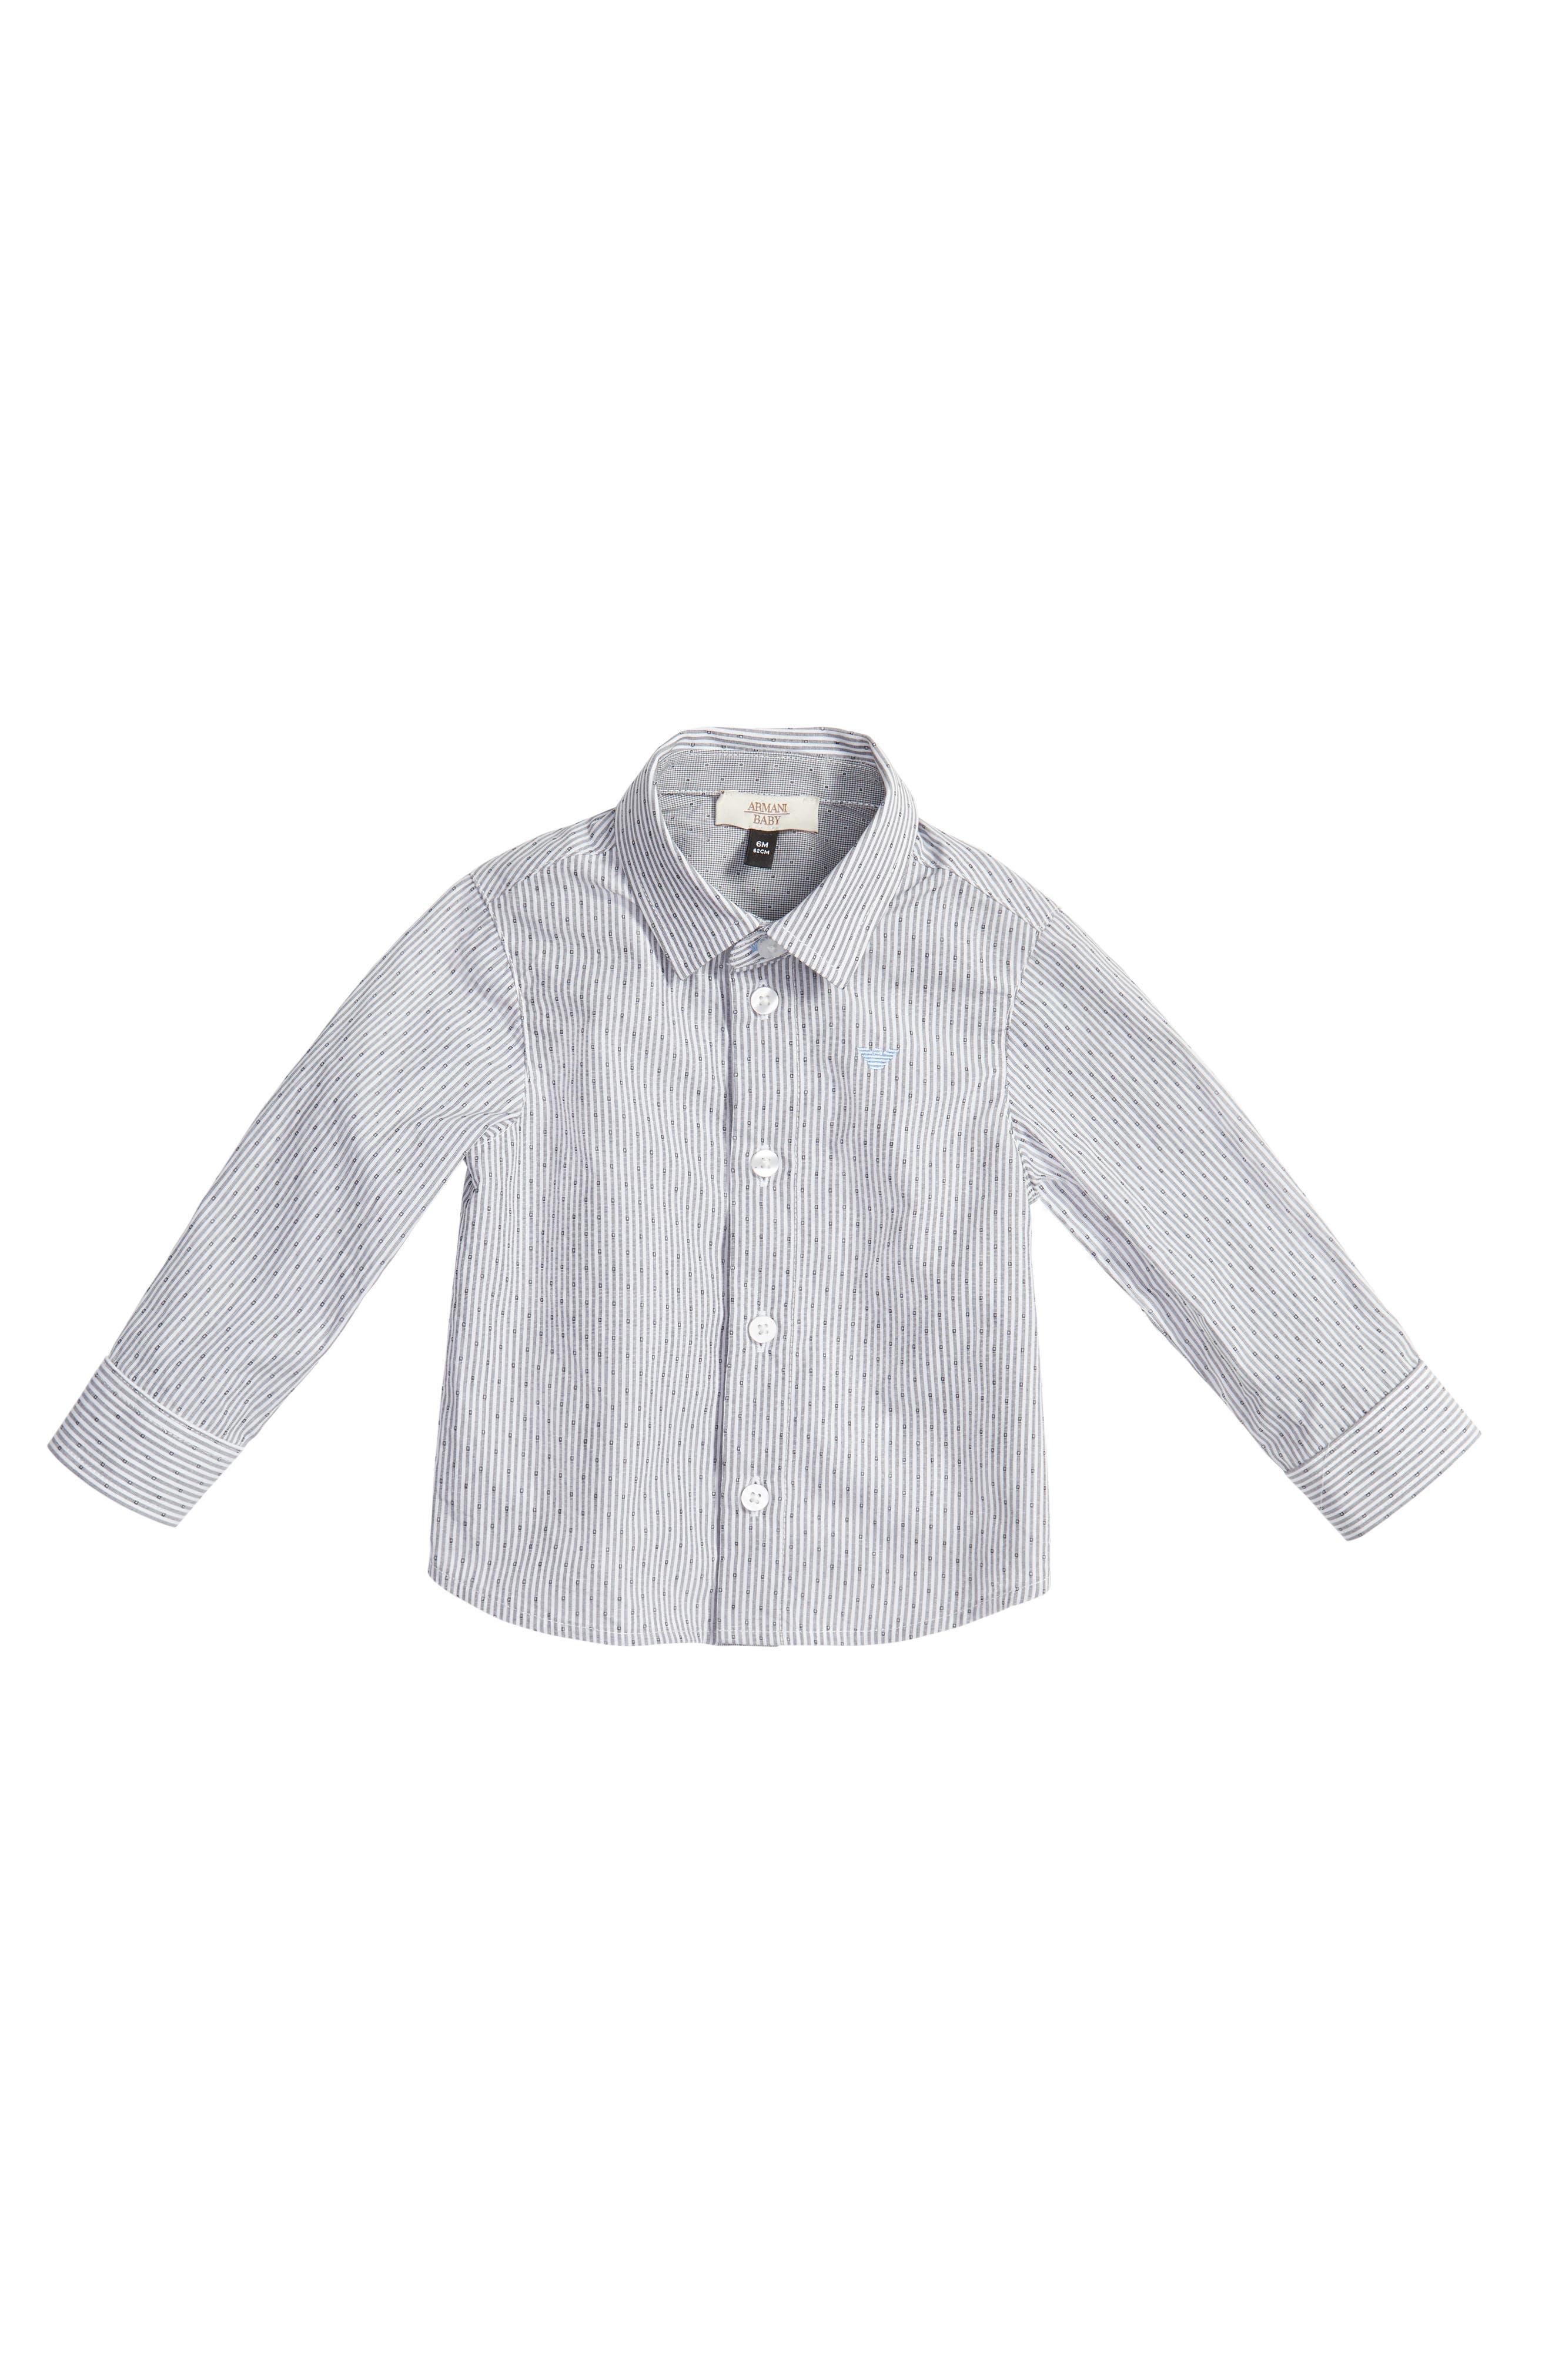 Stripe Dress Shirt,                         Main,                         color,